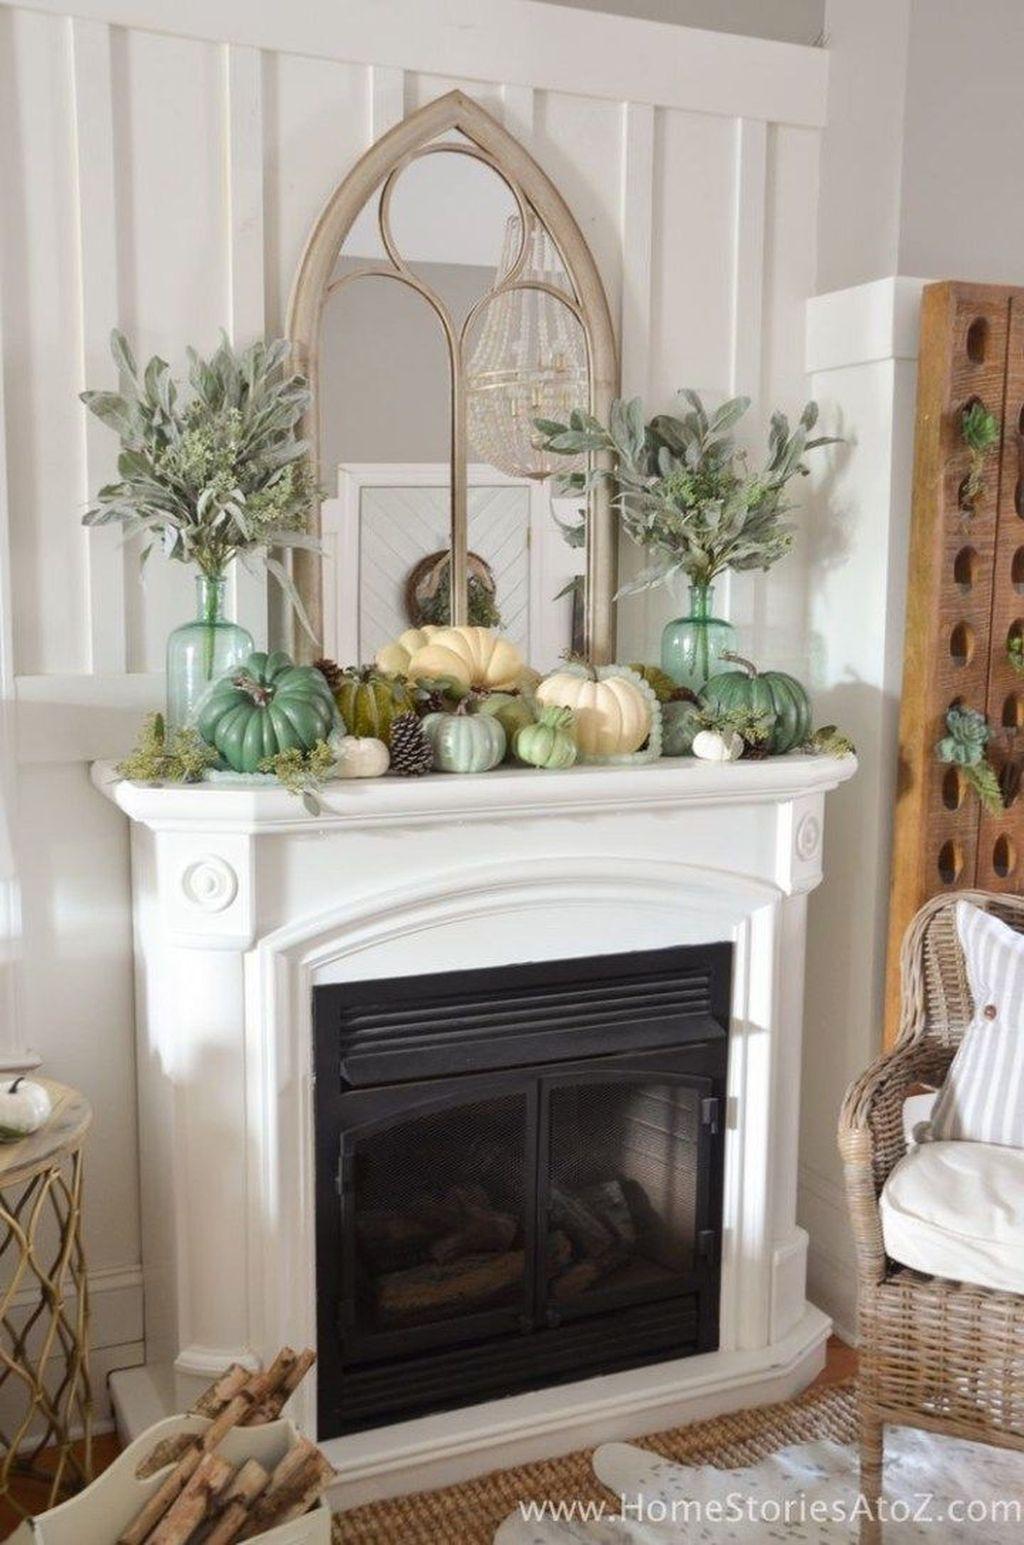 Popular Fall Fireplace Decoration Ideas 26